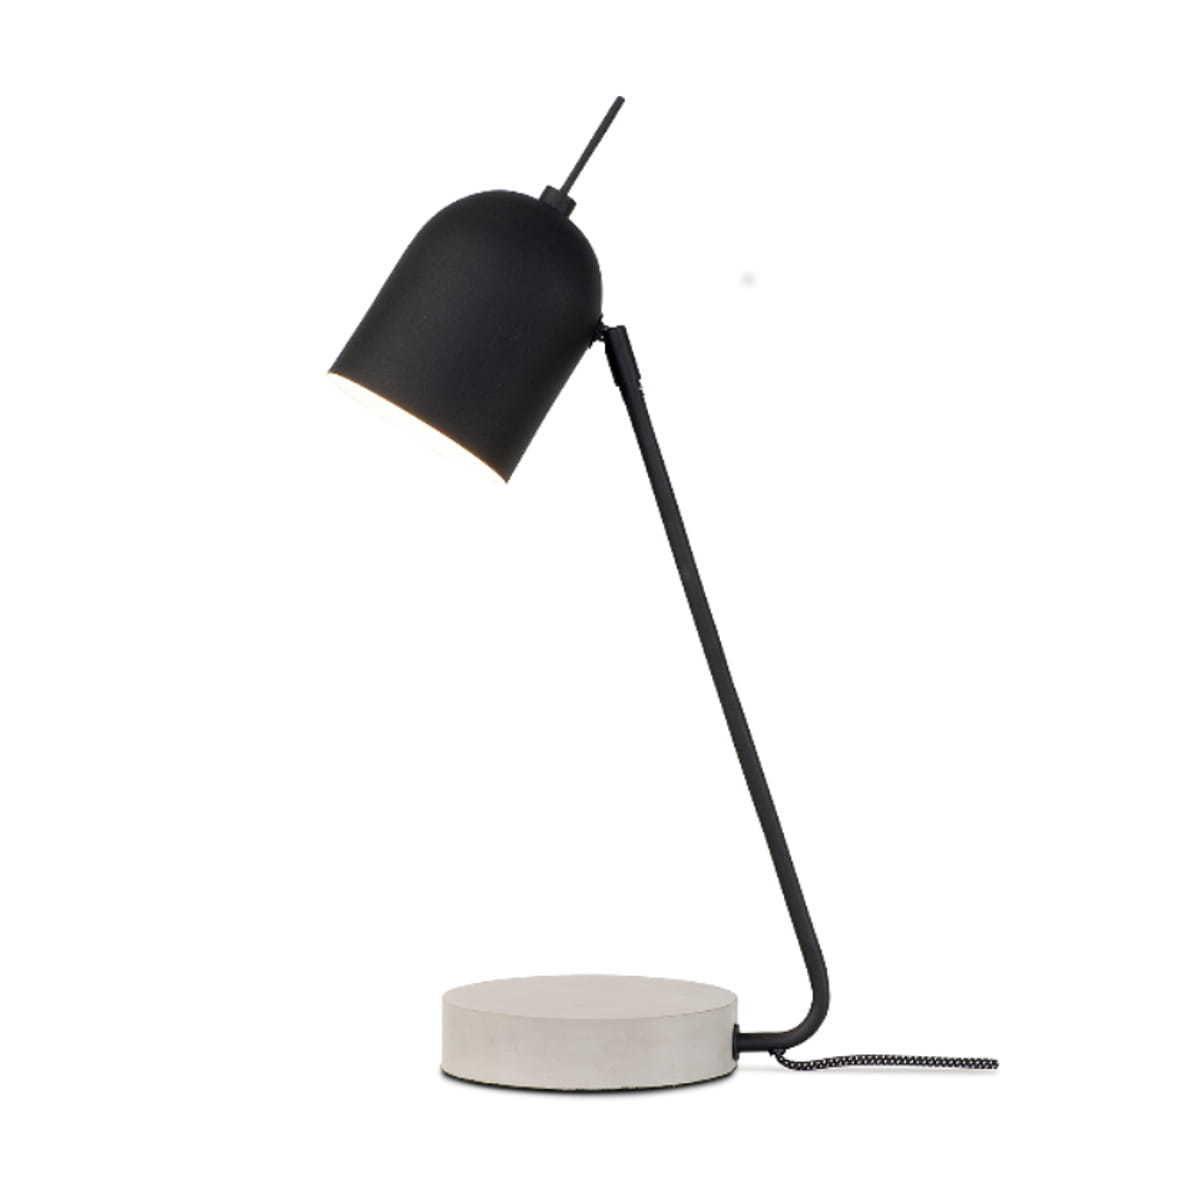 Tafellamp madrid zwart about Romi